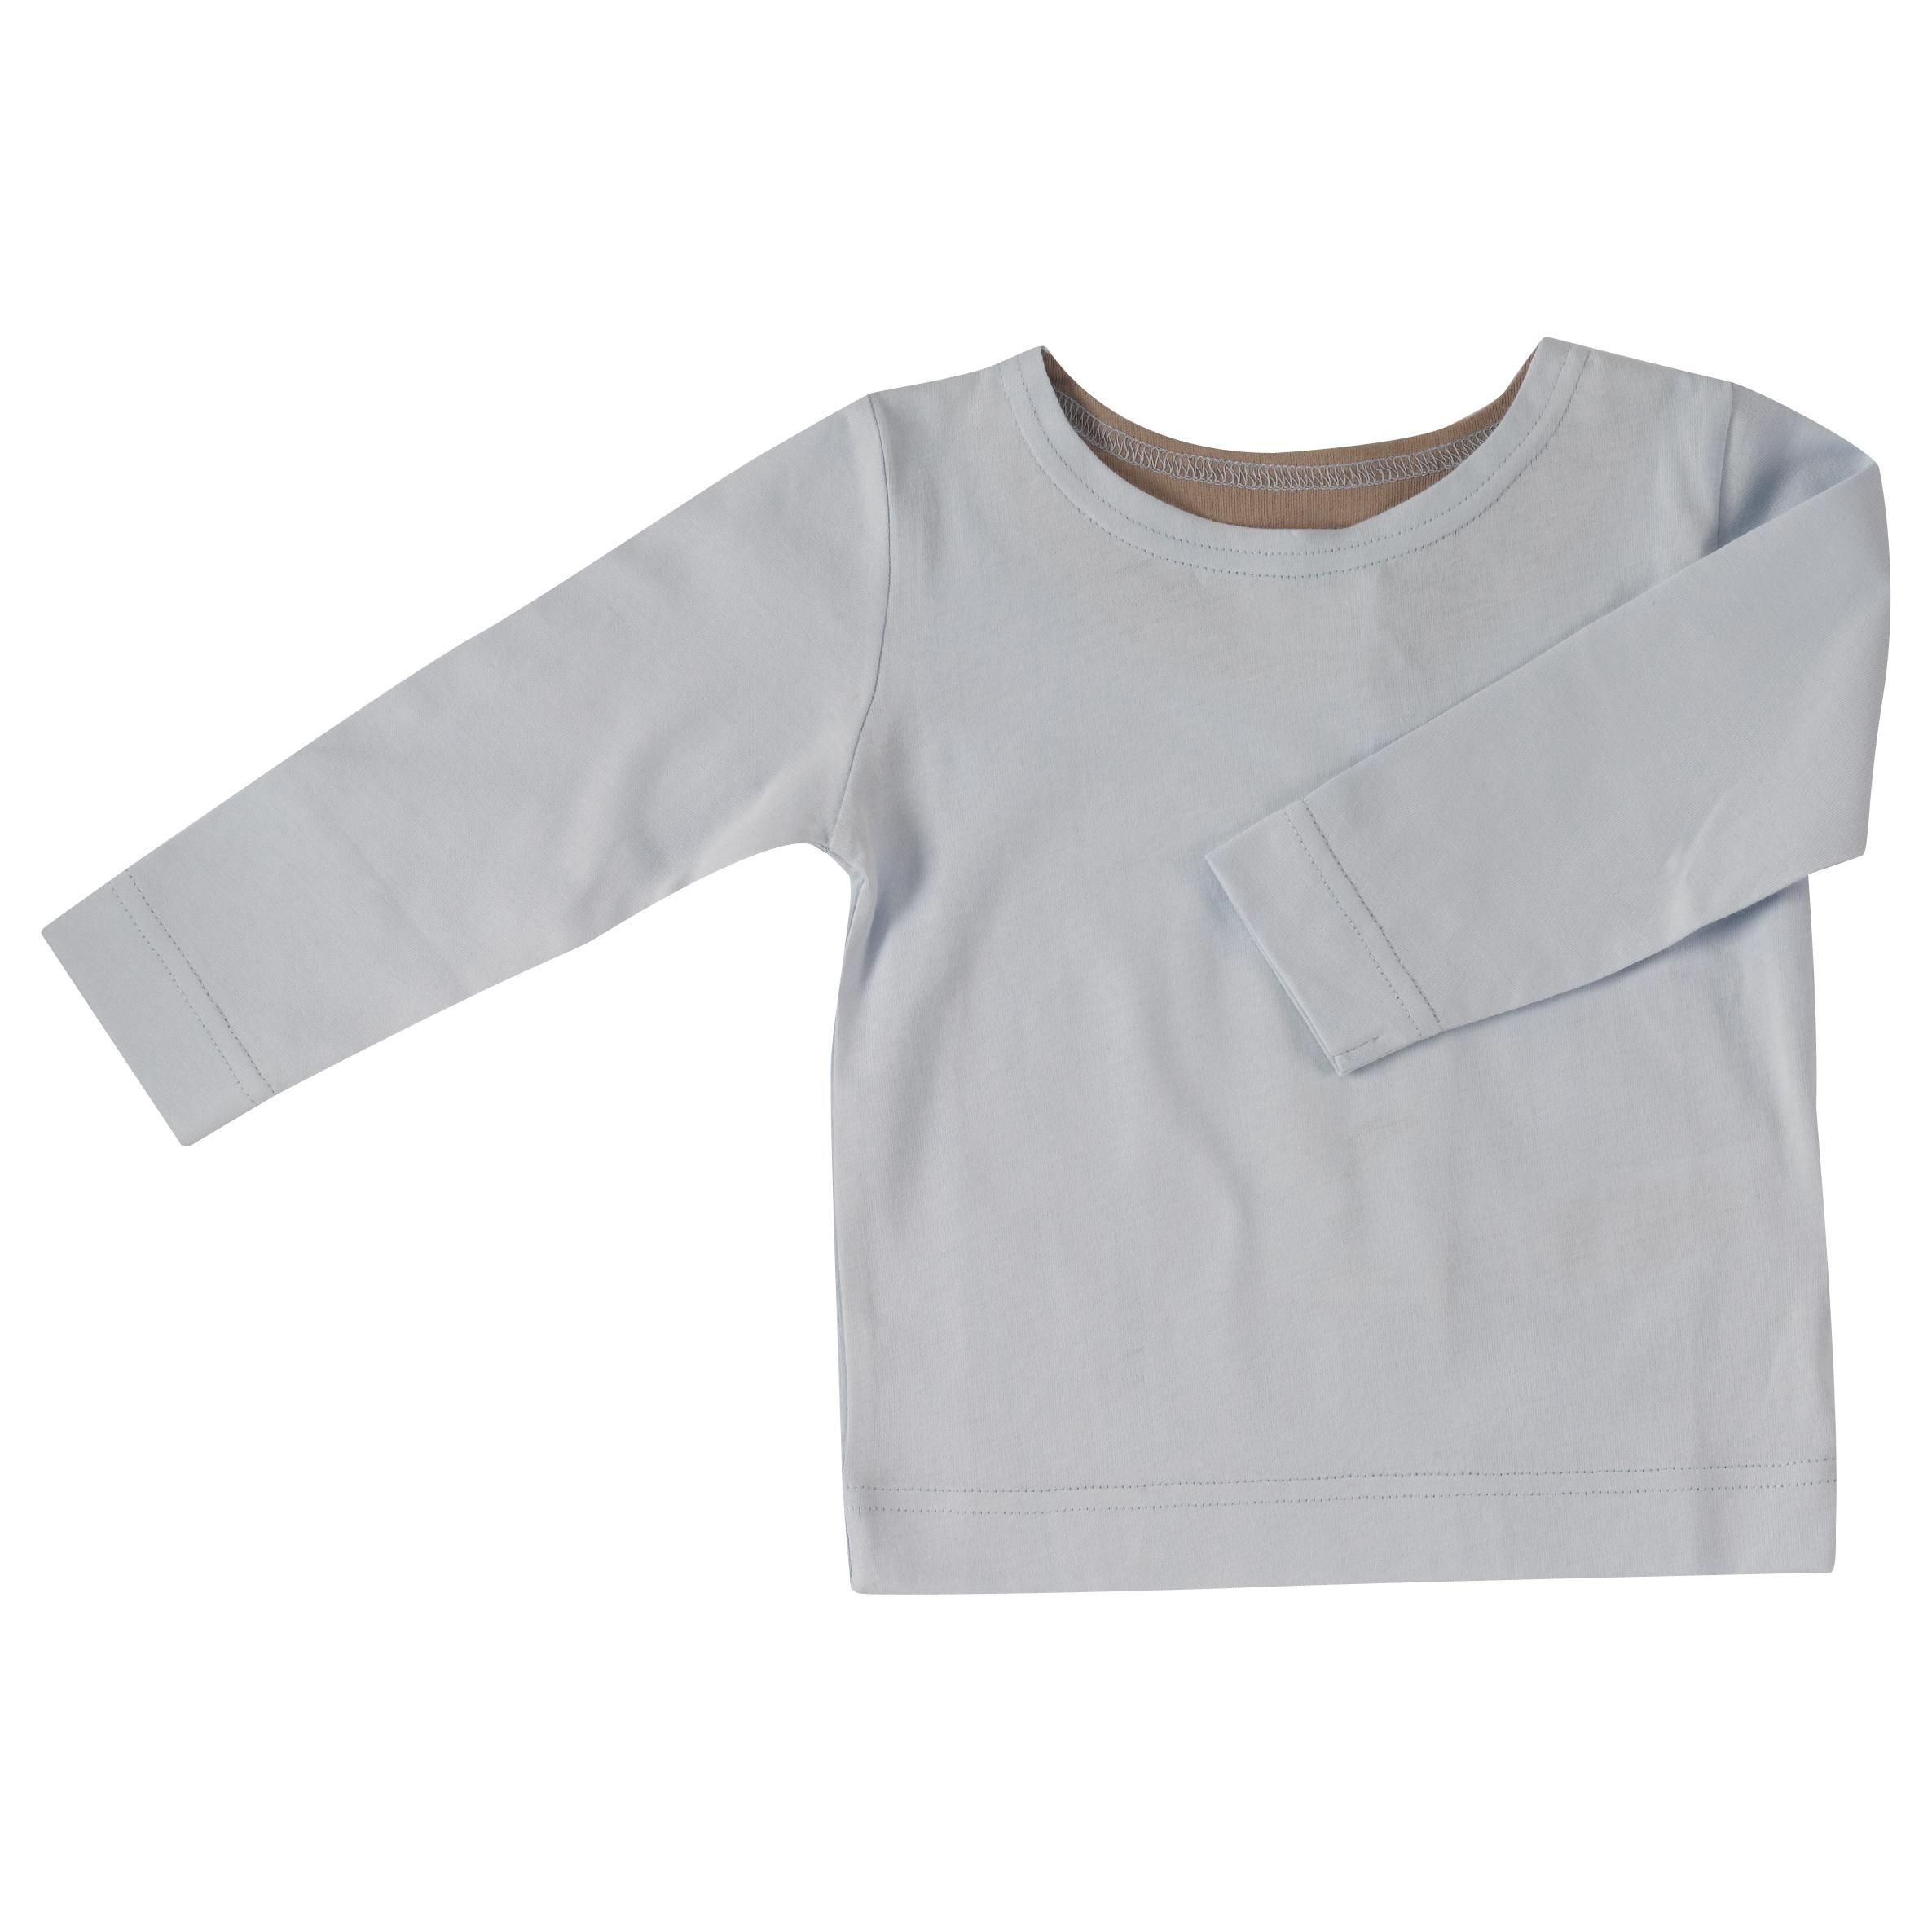 Pigeon - long sleeve t-shirt - Baby blue